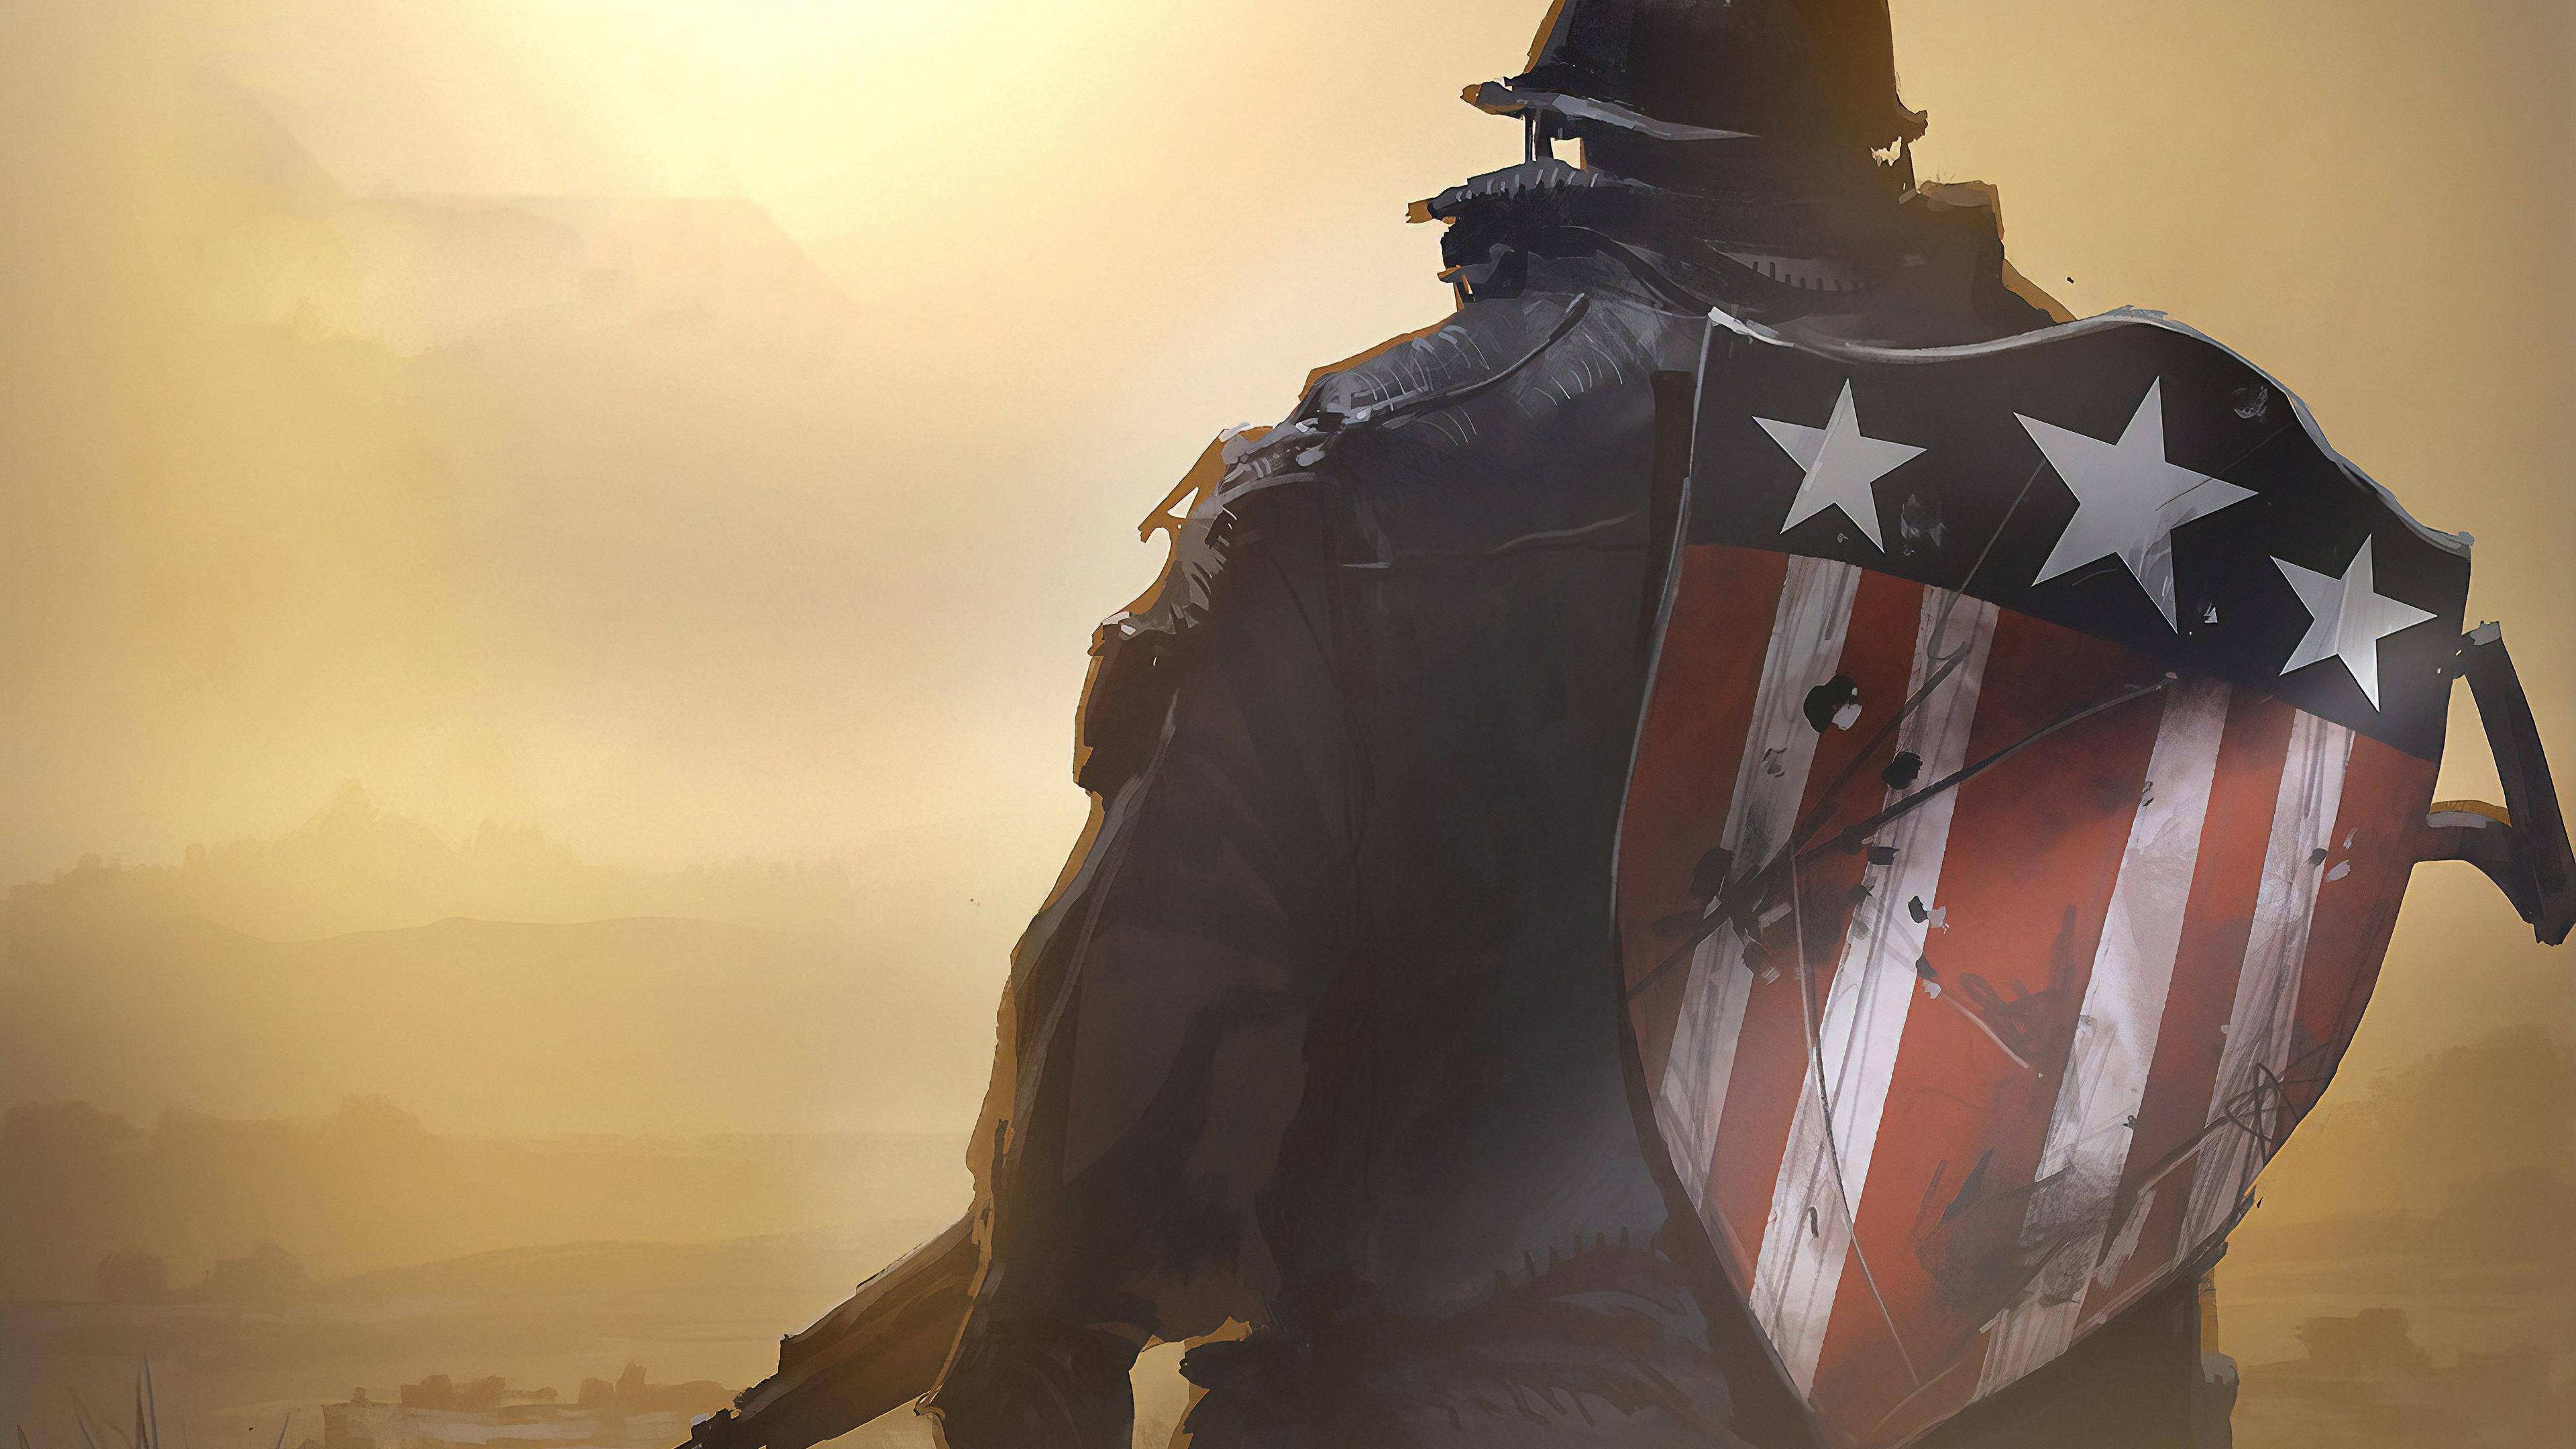 captain america solider 4k 1604347904 - Captain America Solider 4k - Captain America Solider 4k wallpapers